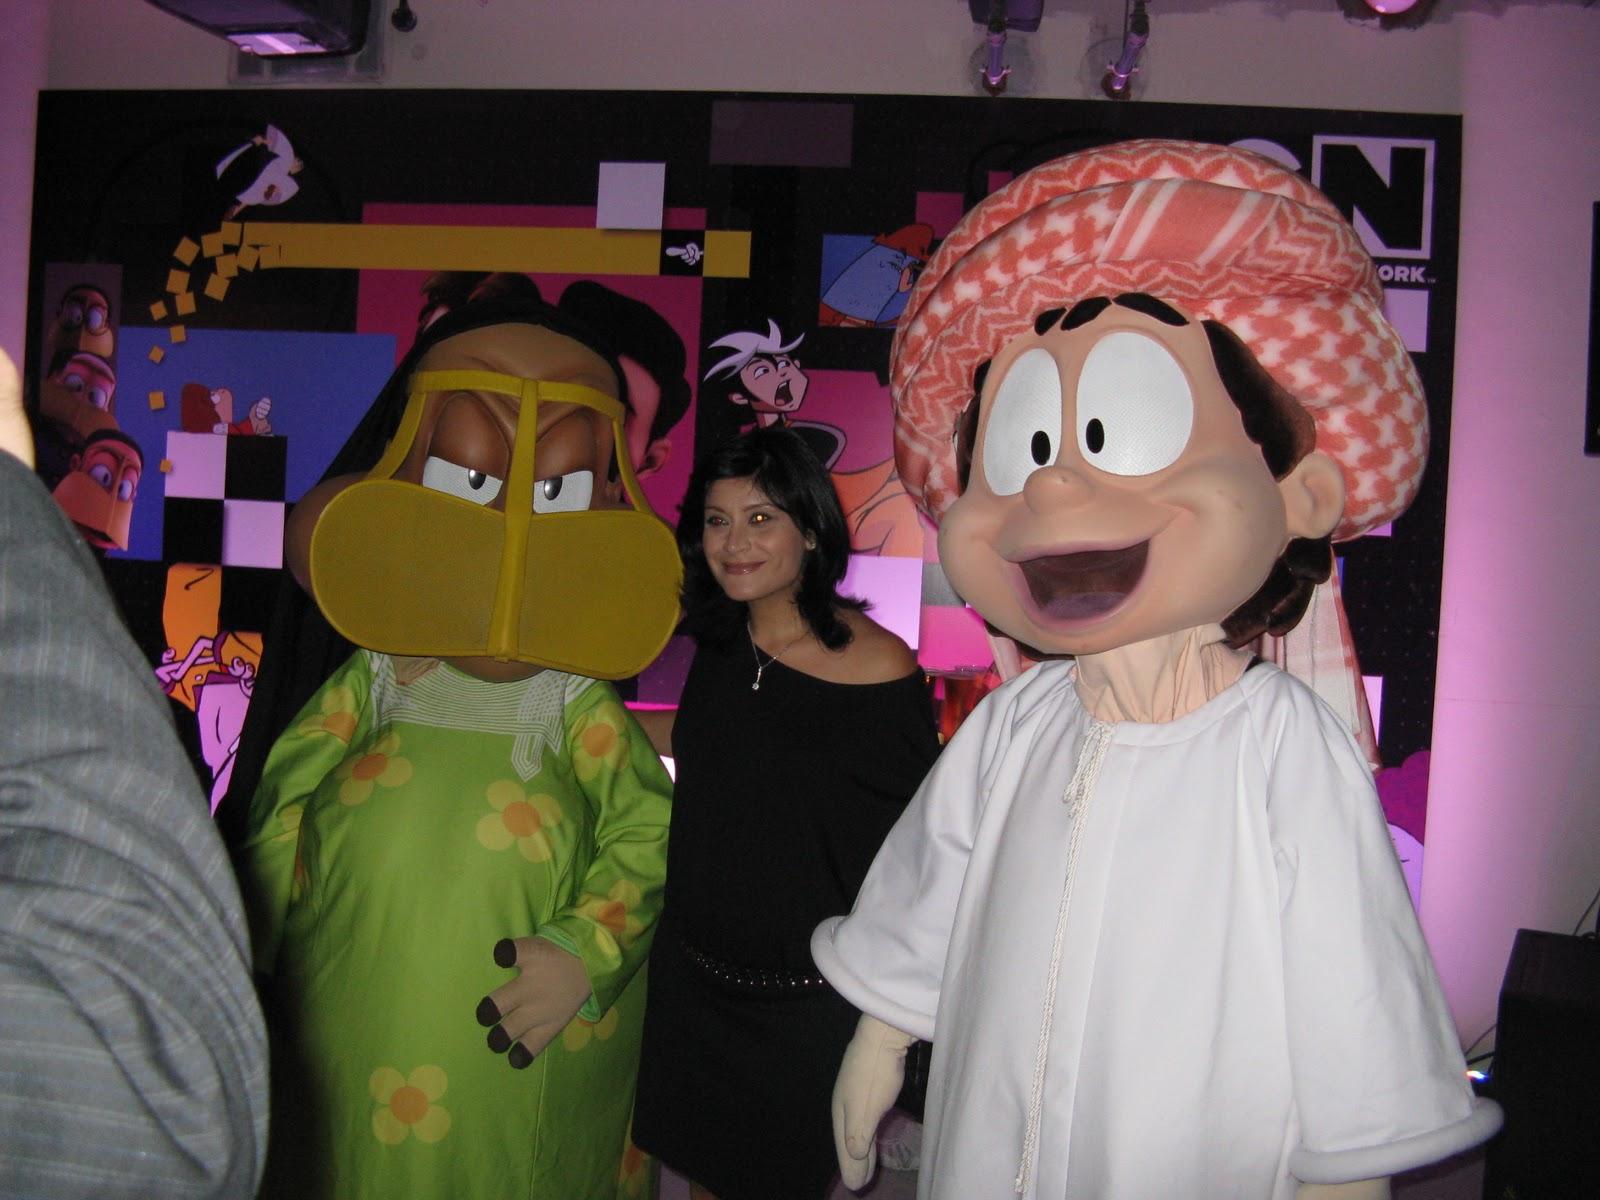 NewsP4U: TBS launches Cartoon Network Arabic 24/7 free-to